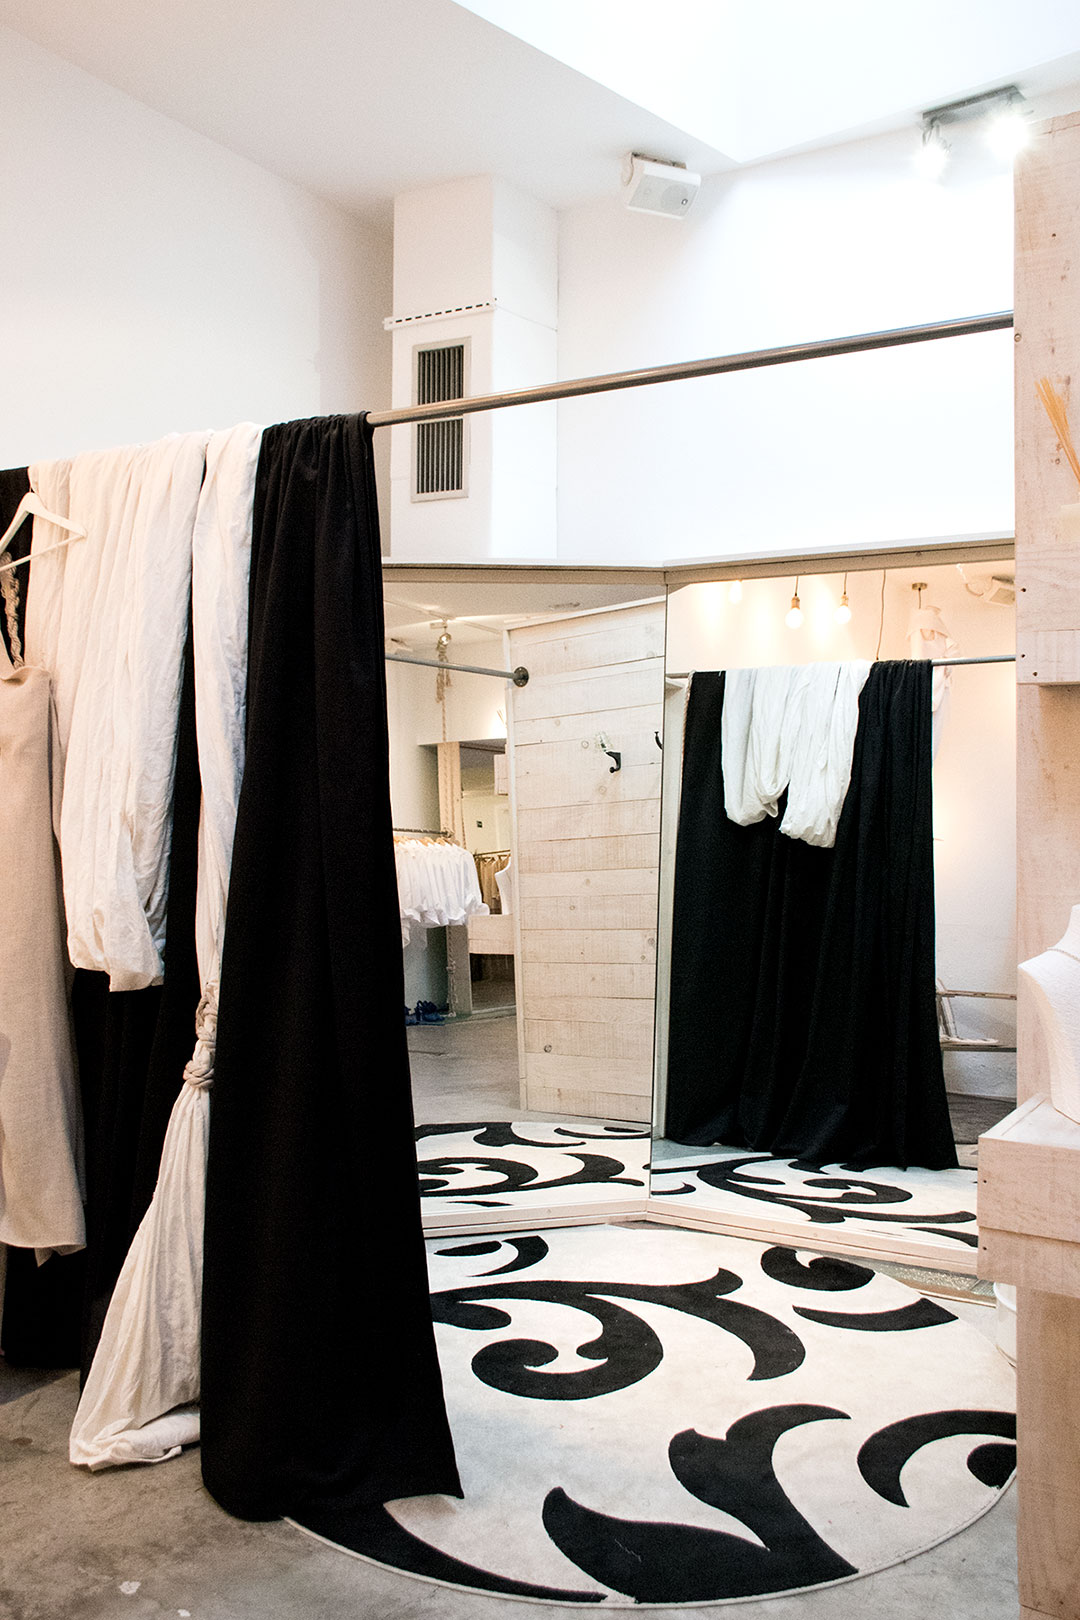 ulises-merida-atelier-mitmeblog-web-01